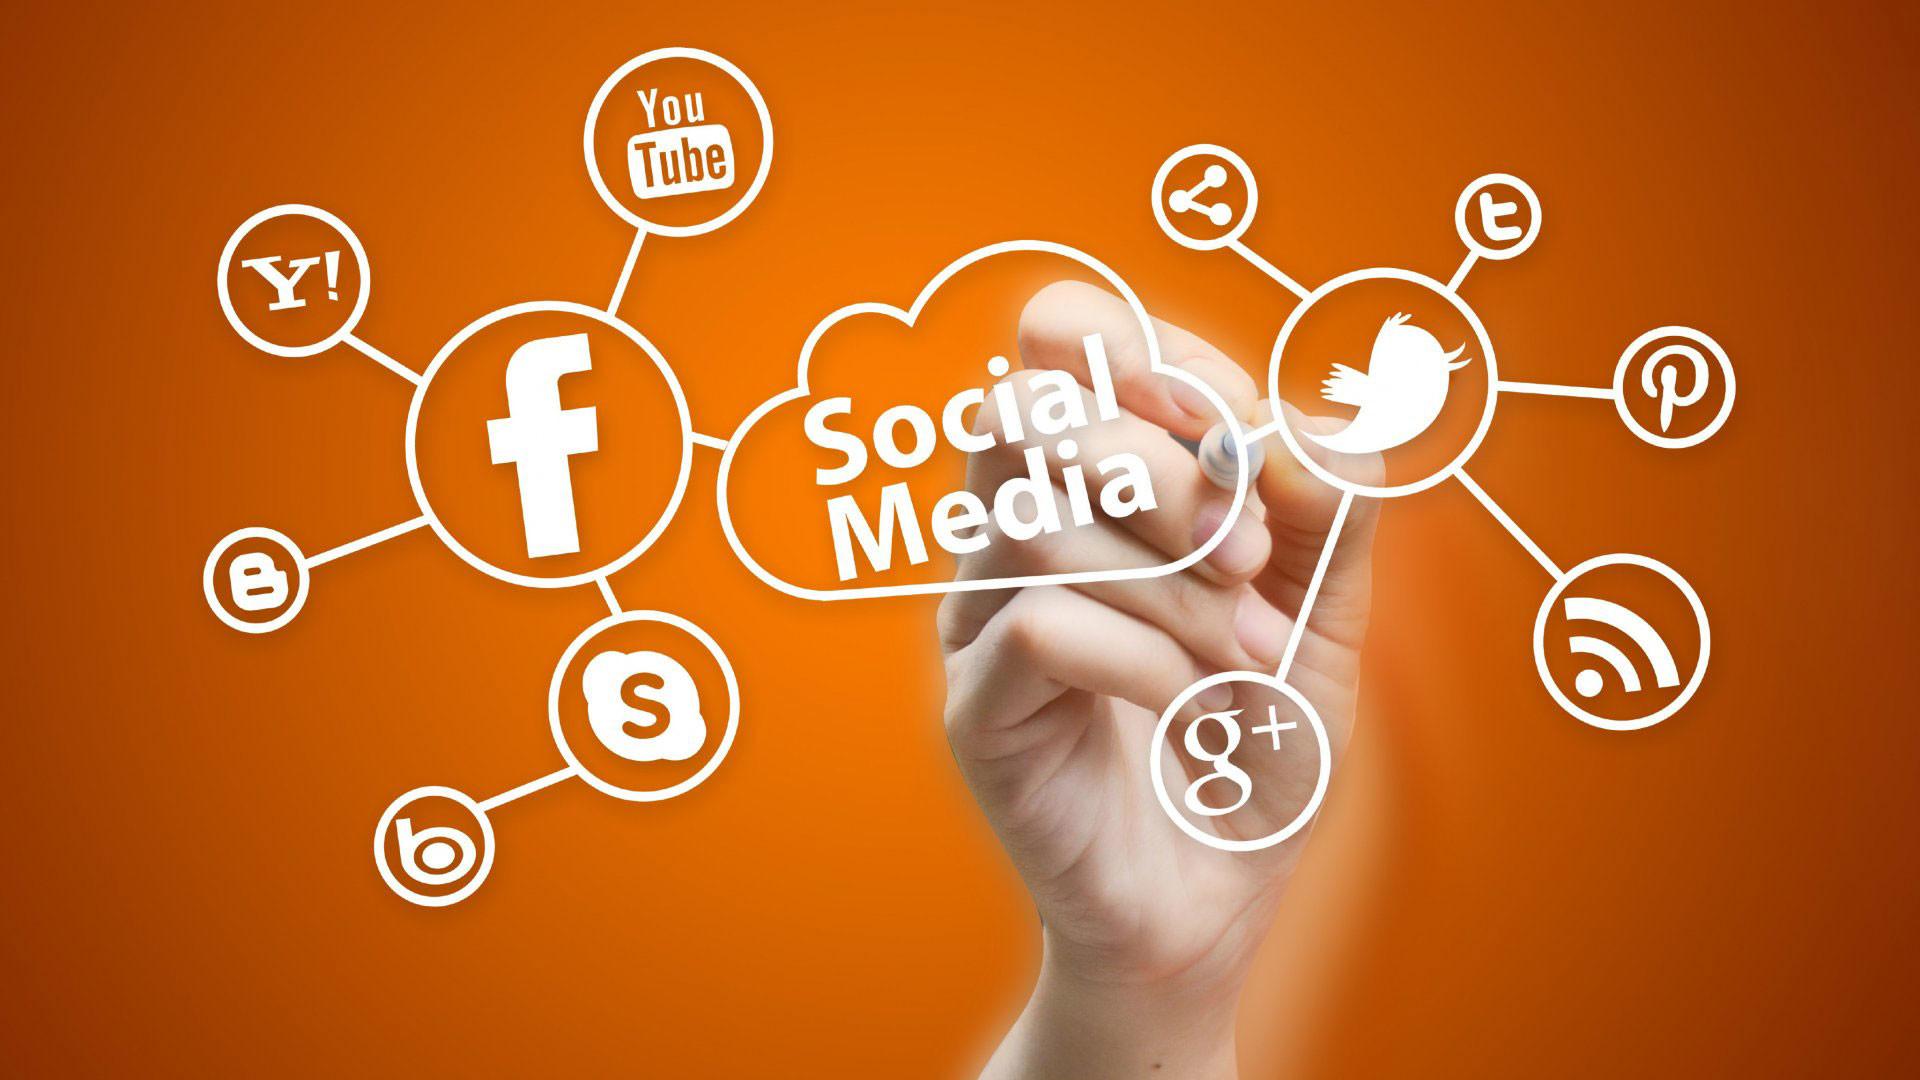 hd pics photos stunning attractive social media 20 hd desktop background  wallpaper